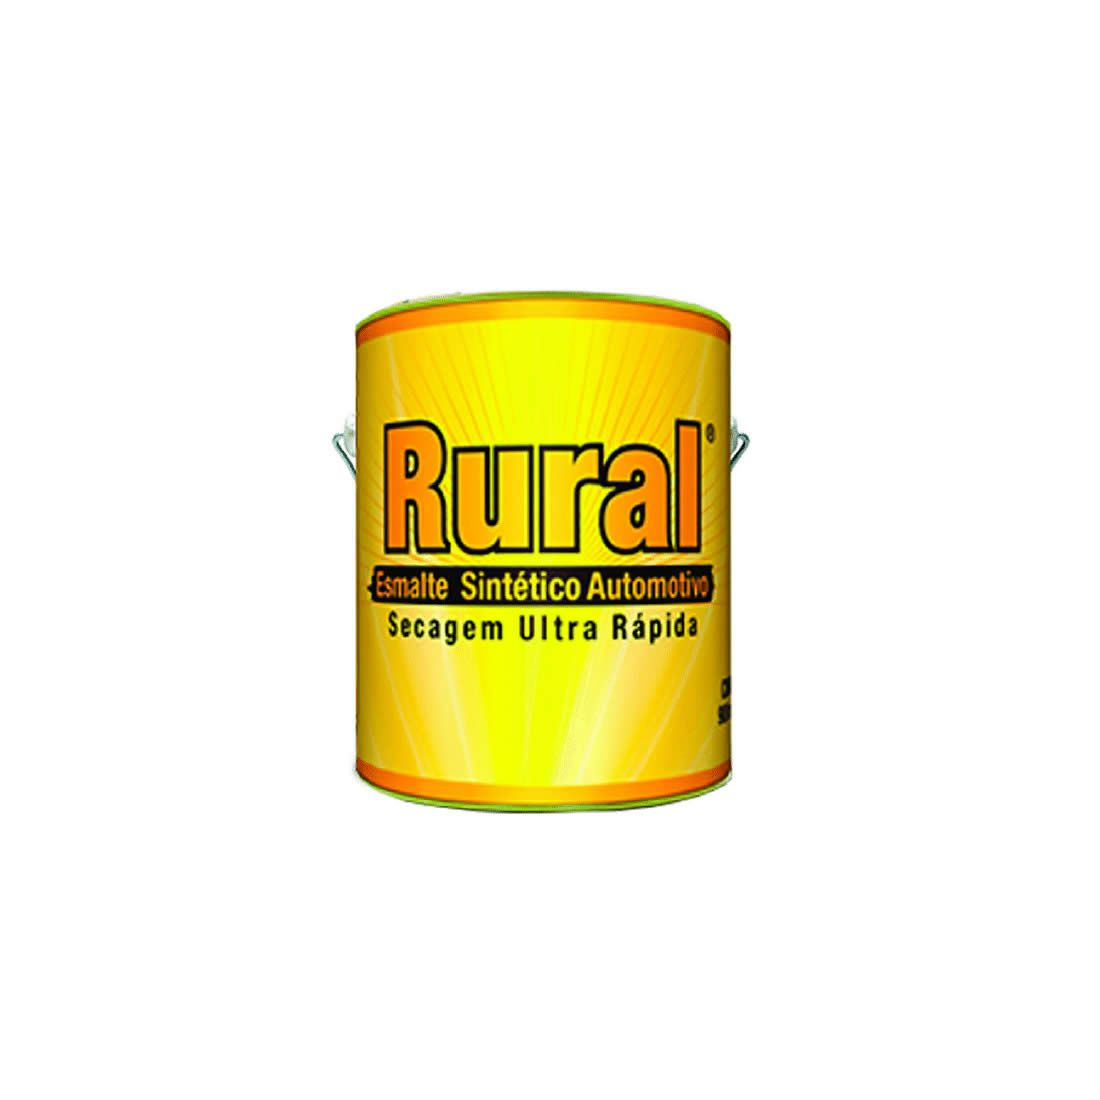 Esmalte Sintético Rural Secagem Ultra Rápido Amarelo New Holland 2002 6147 3,6Lt